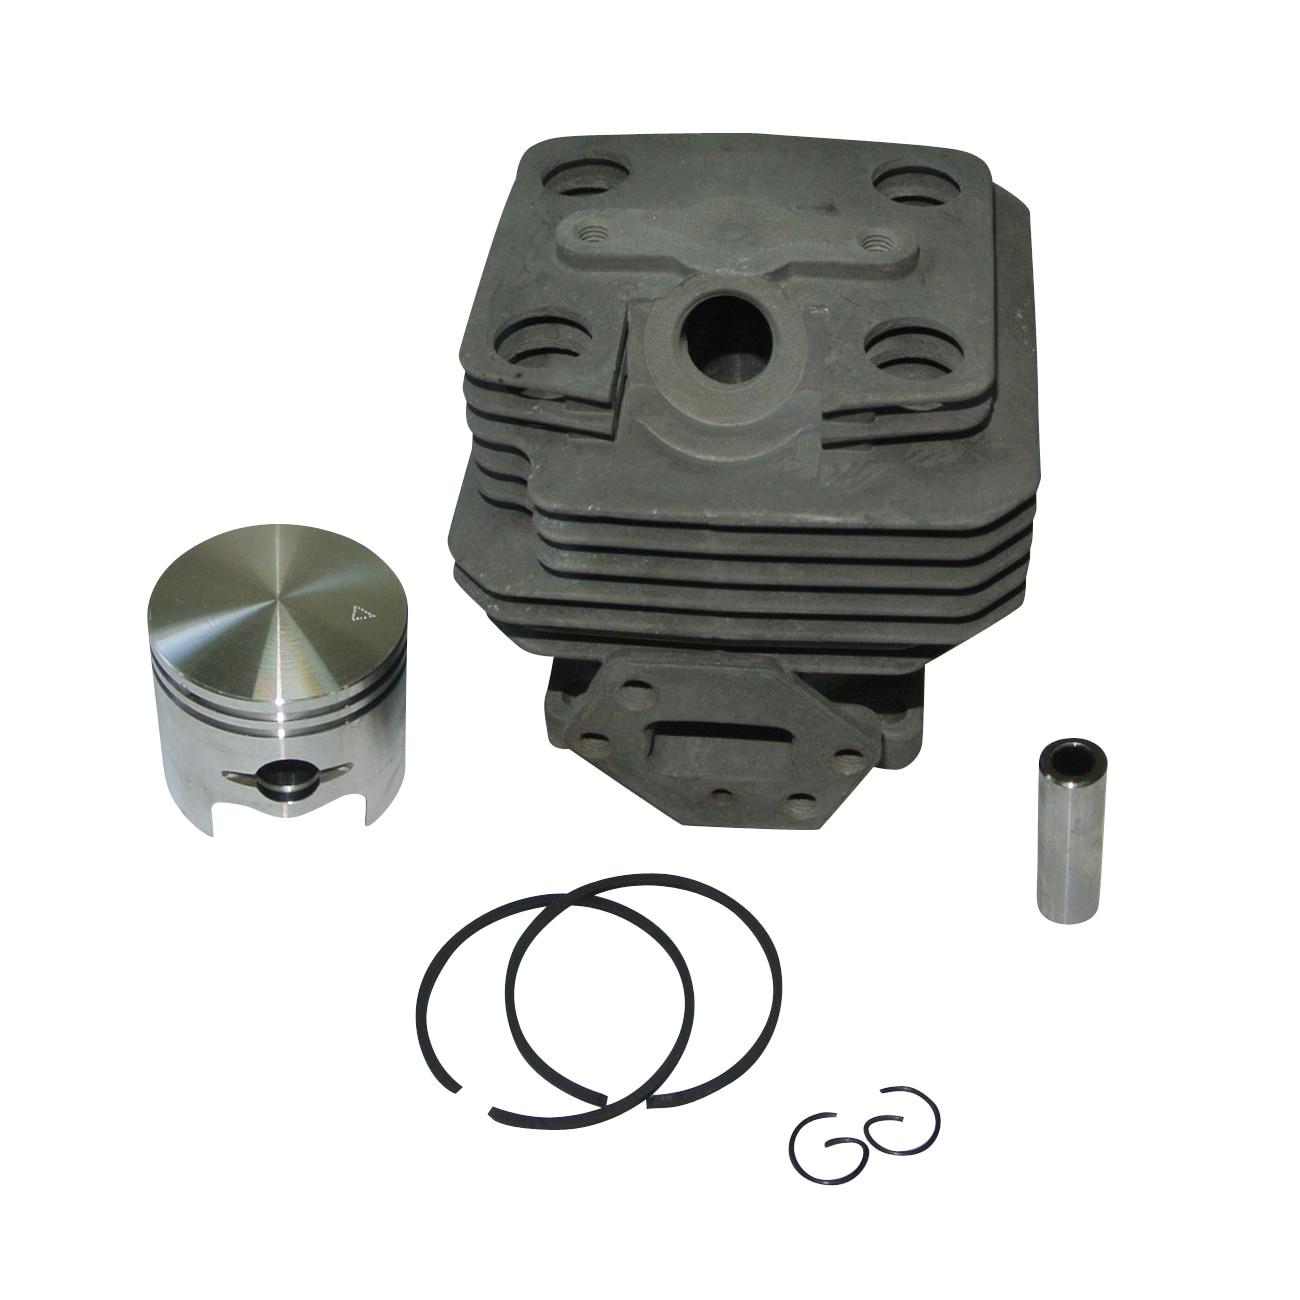 Cylinder Piston Kit fit ZENOAH KOMATSU G45L BC4301 FW PE2500 H 40mm # 450041110 high quality excavator seal kit for komatsu pc200 5 bucket cylinder repair seal kit 707 99 45220